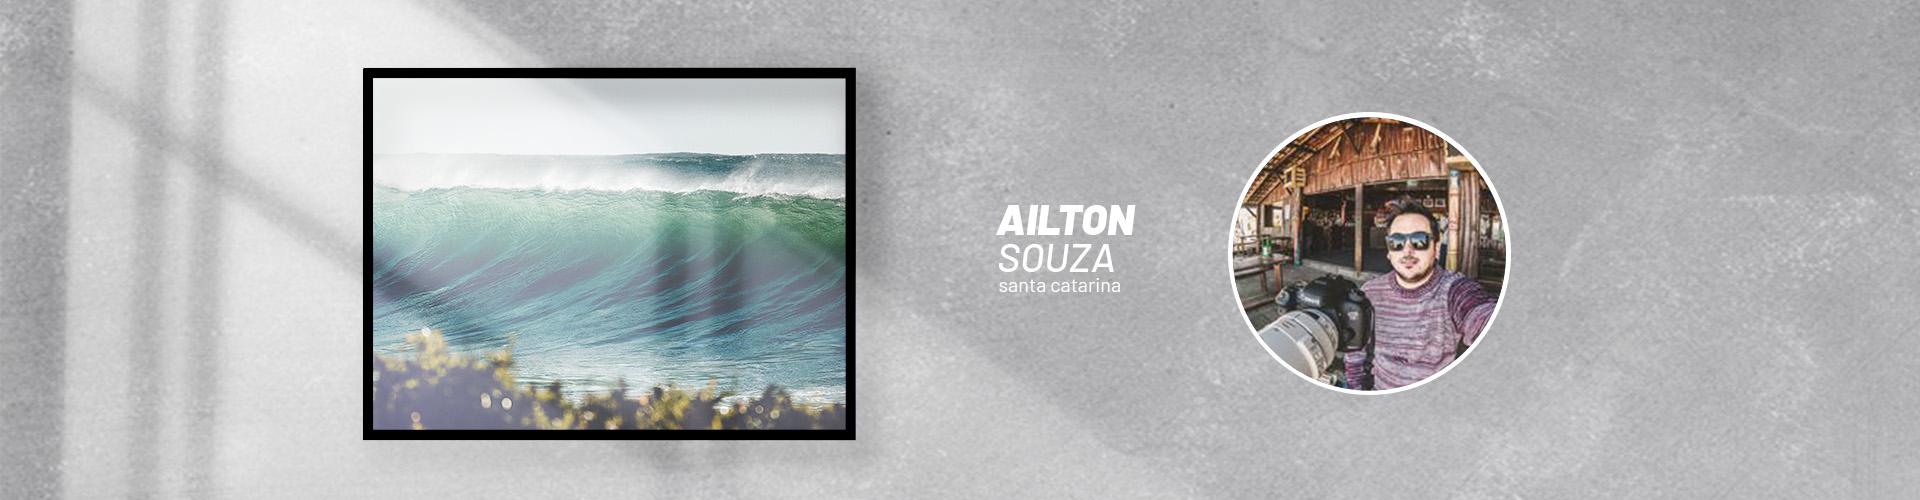 Página Artista | Ailton Souza